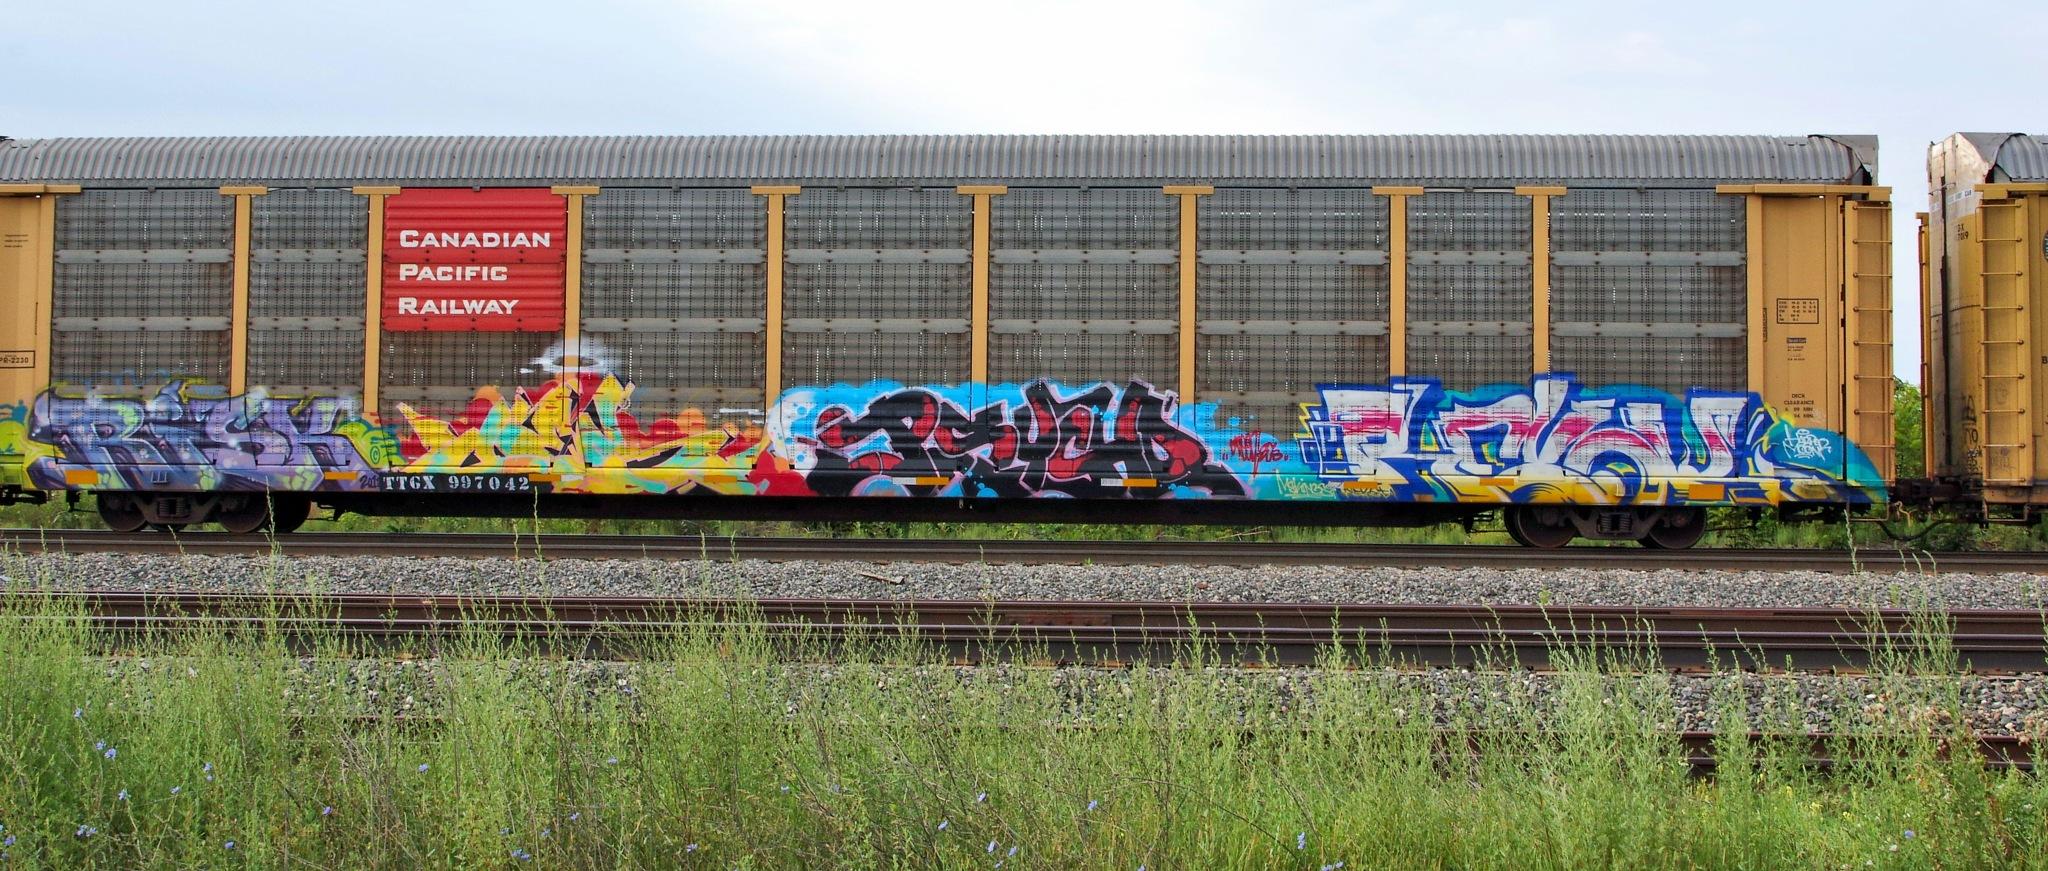 Train Graffiti by chuckhildebrandt7